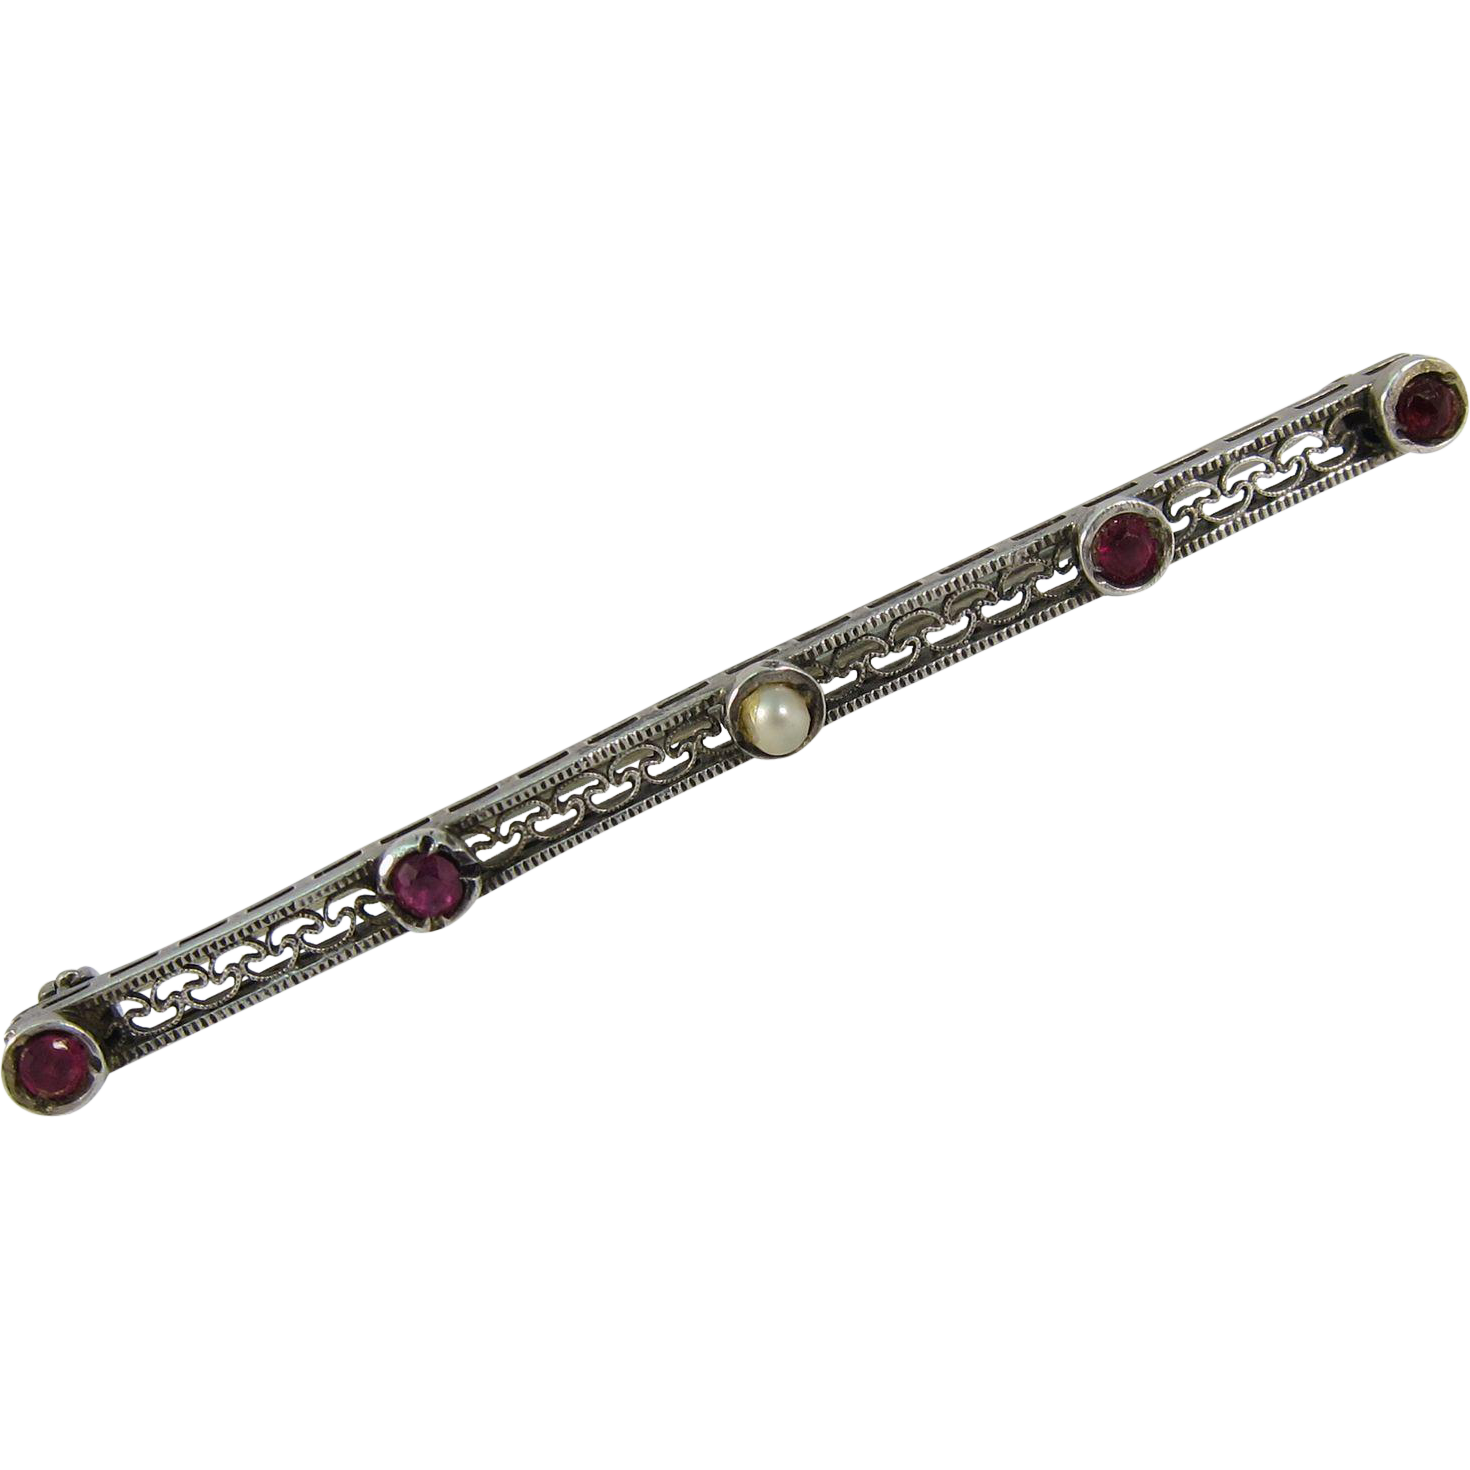 Art Deco Filigree Sterling Silver Bar Pin